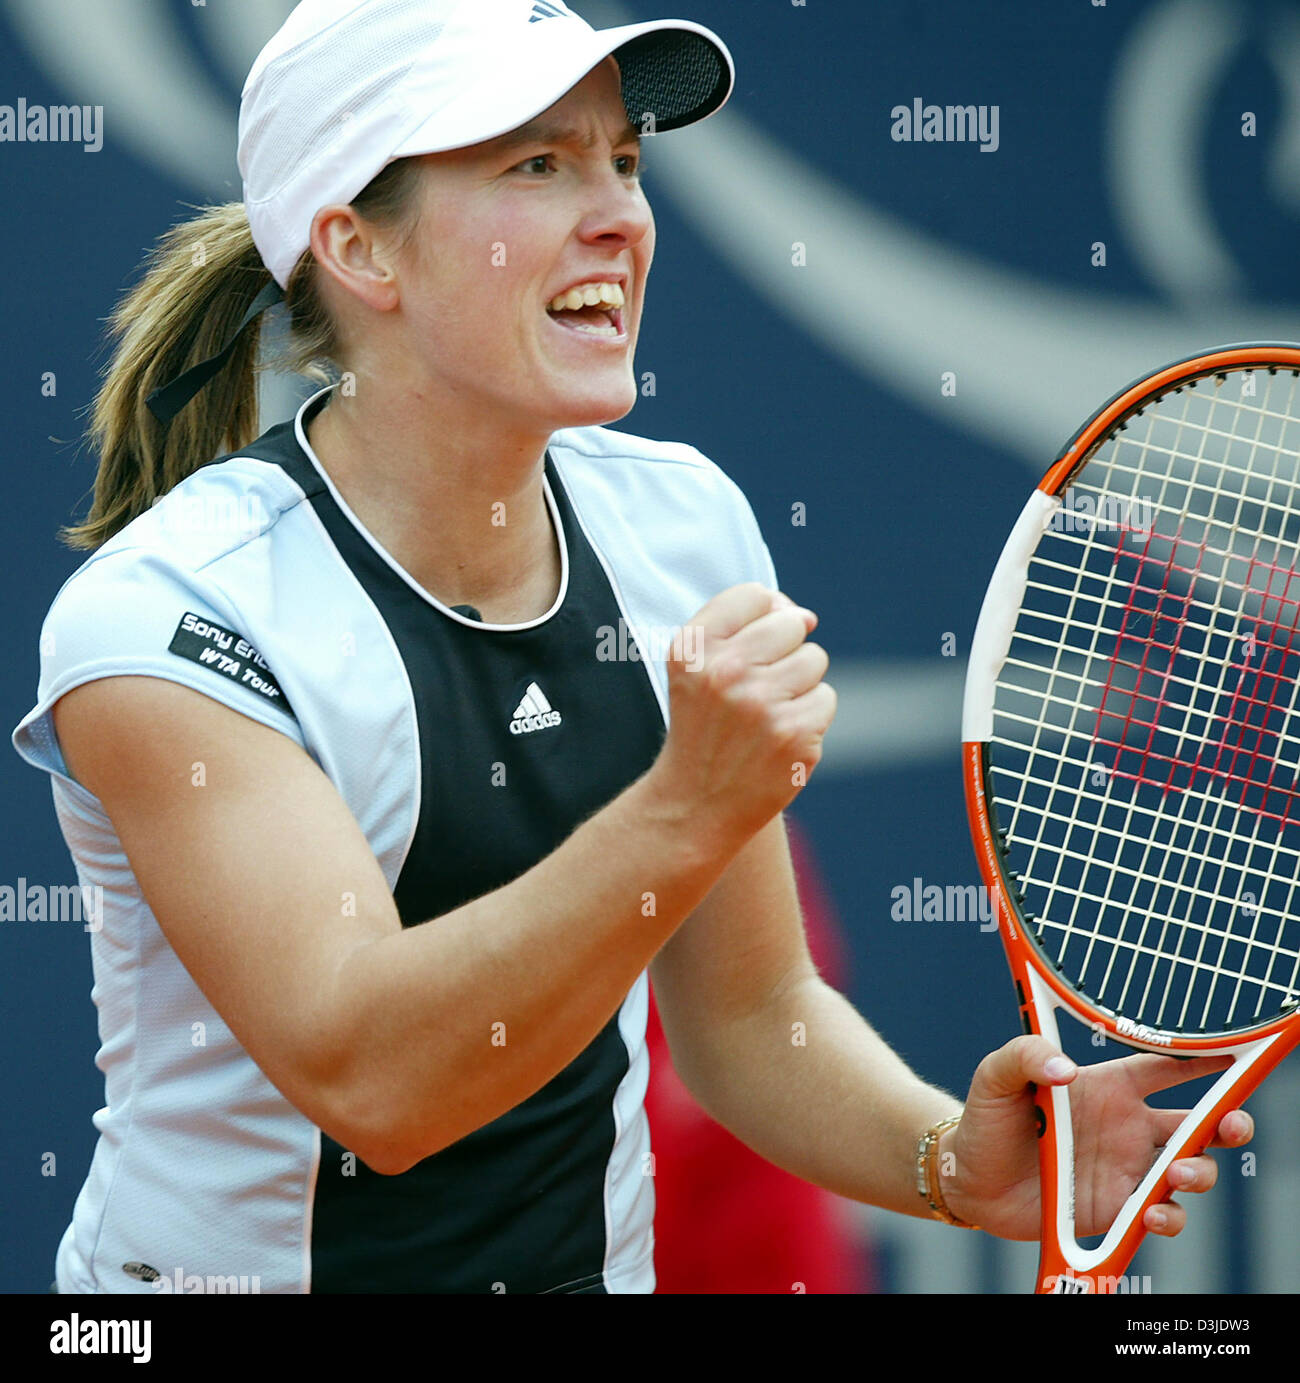 dpa Belgian tennis player Justine Henin Hardennecheers in the